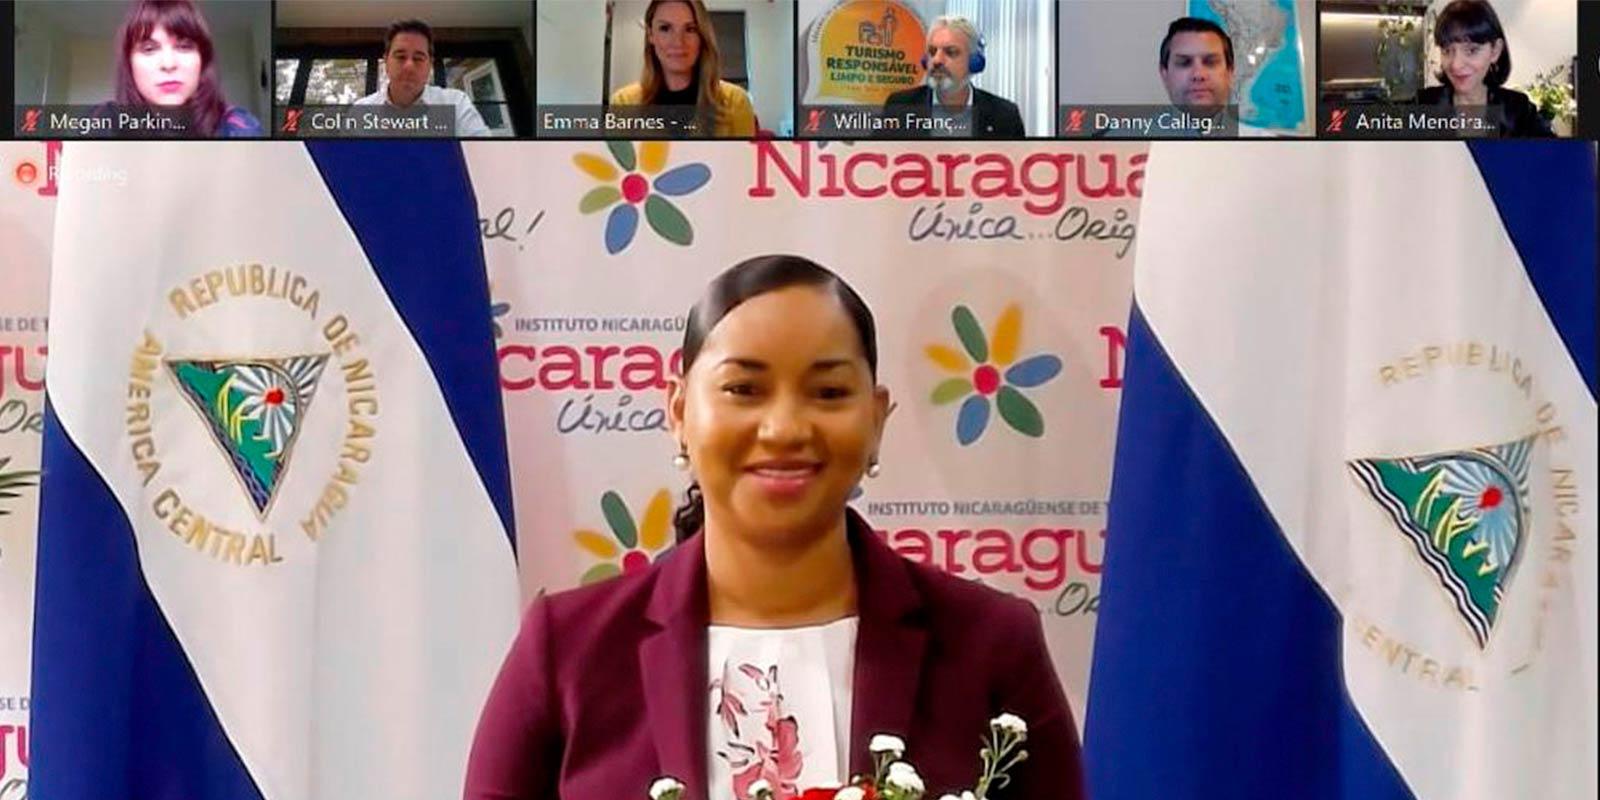 Nicaragua-webinar-avances-de-la-industria